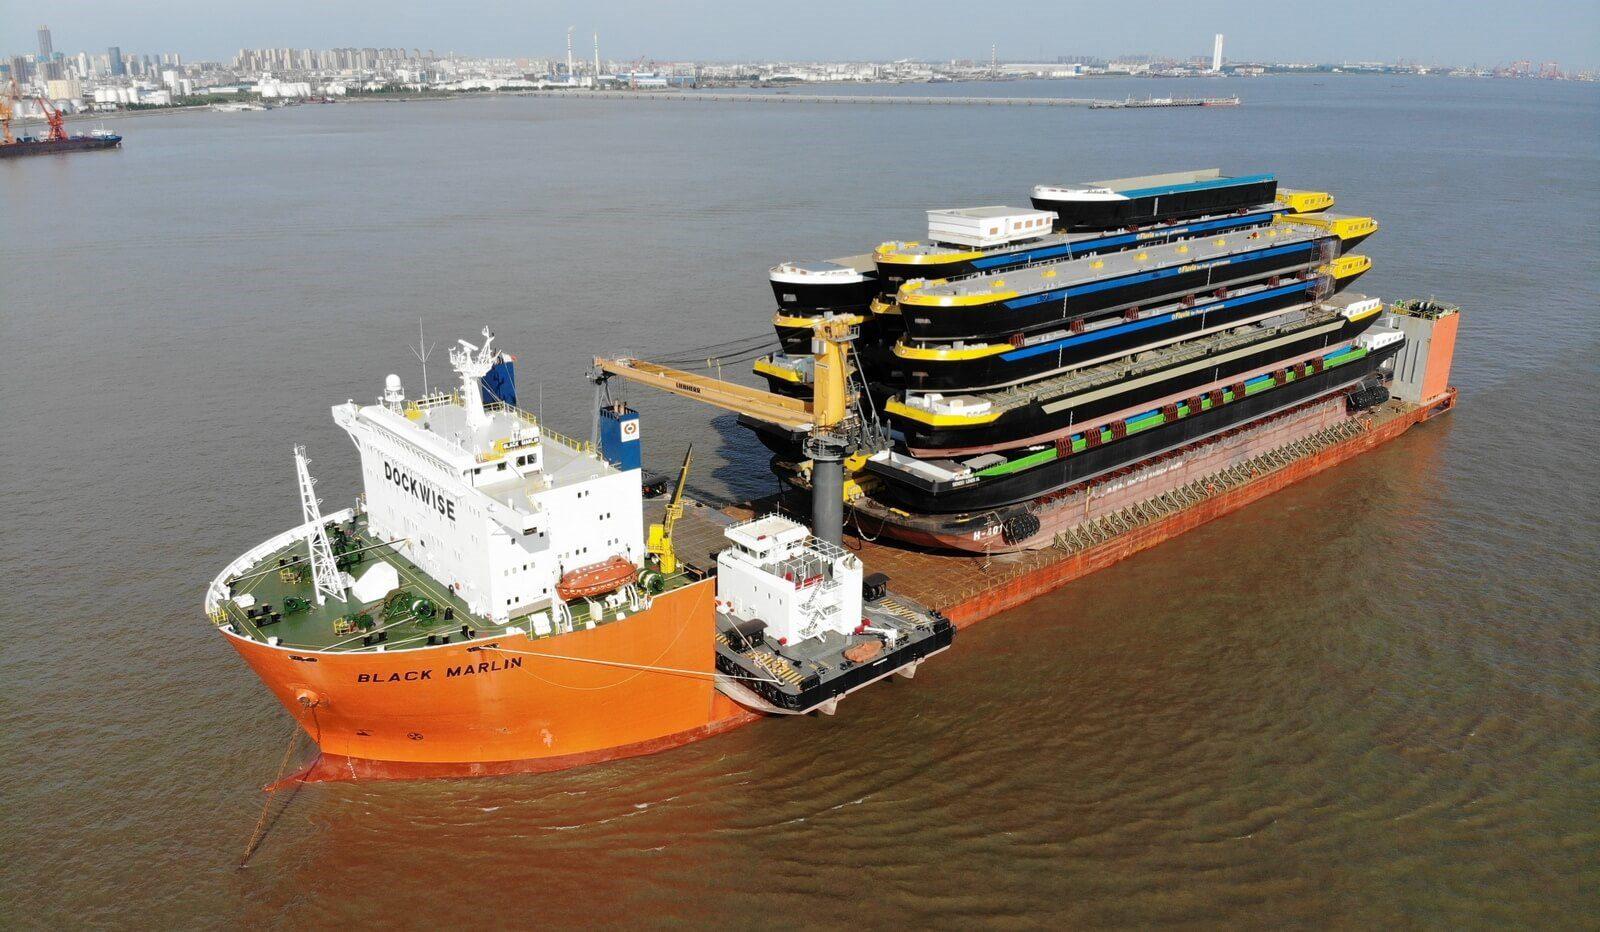 Black marlin heavy lift vessel